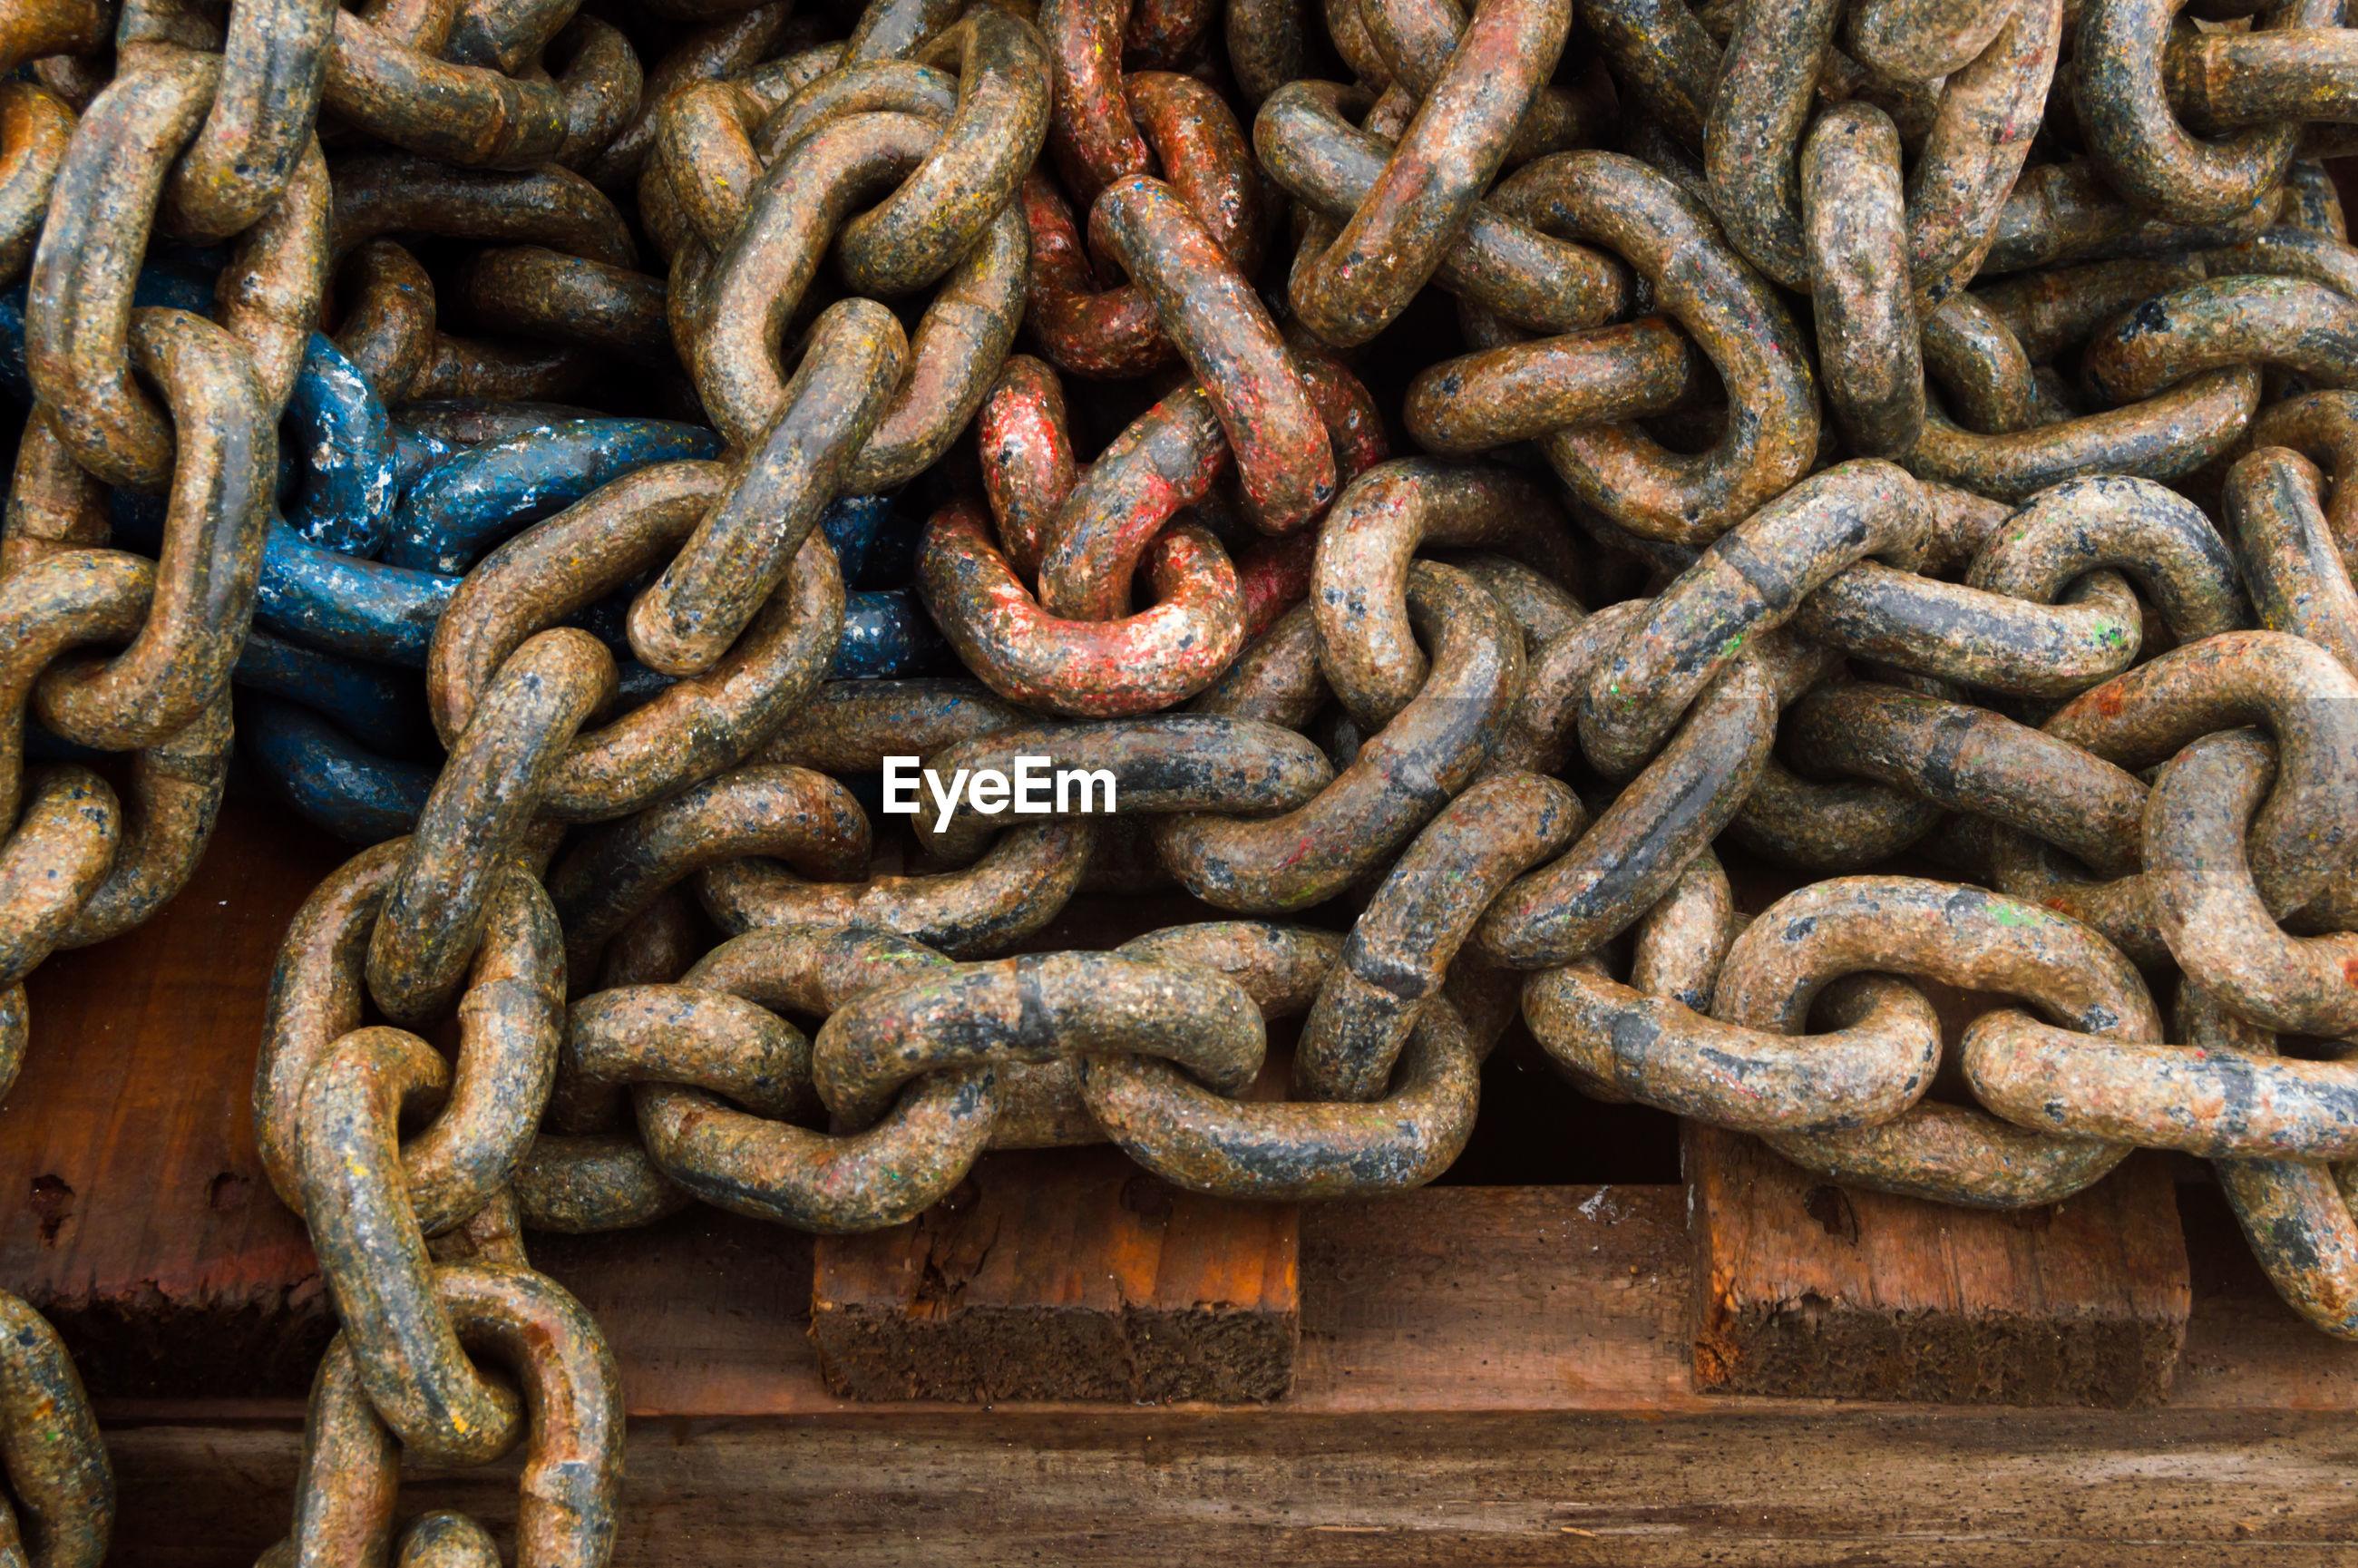 Full frame shot of rusty metal chain